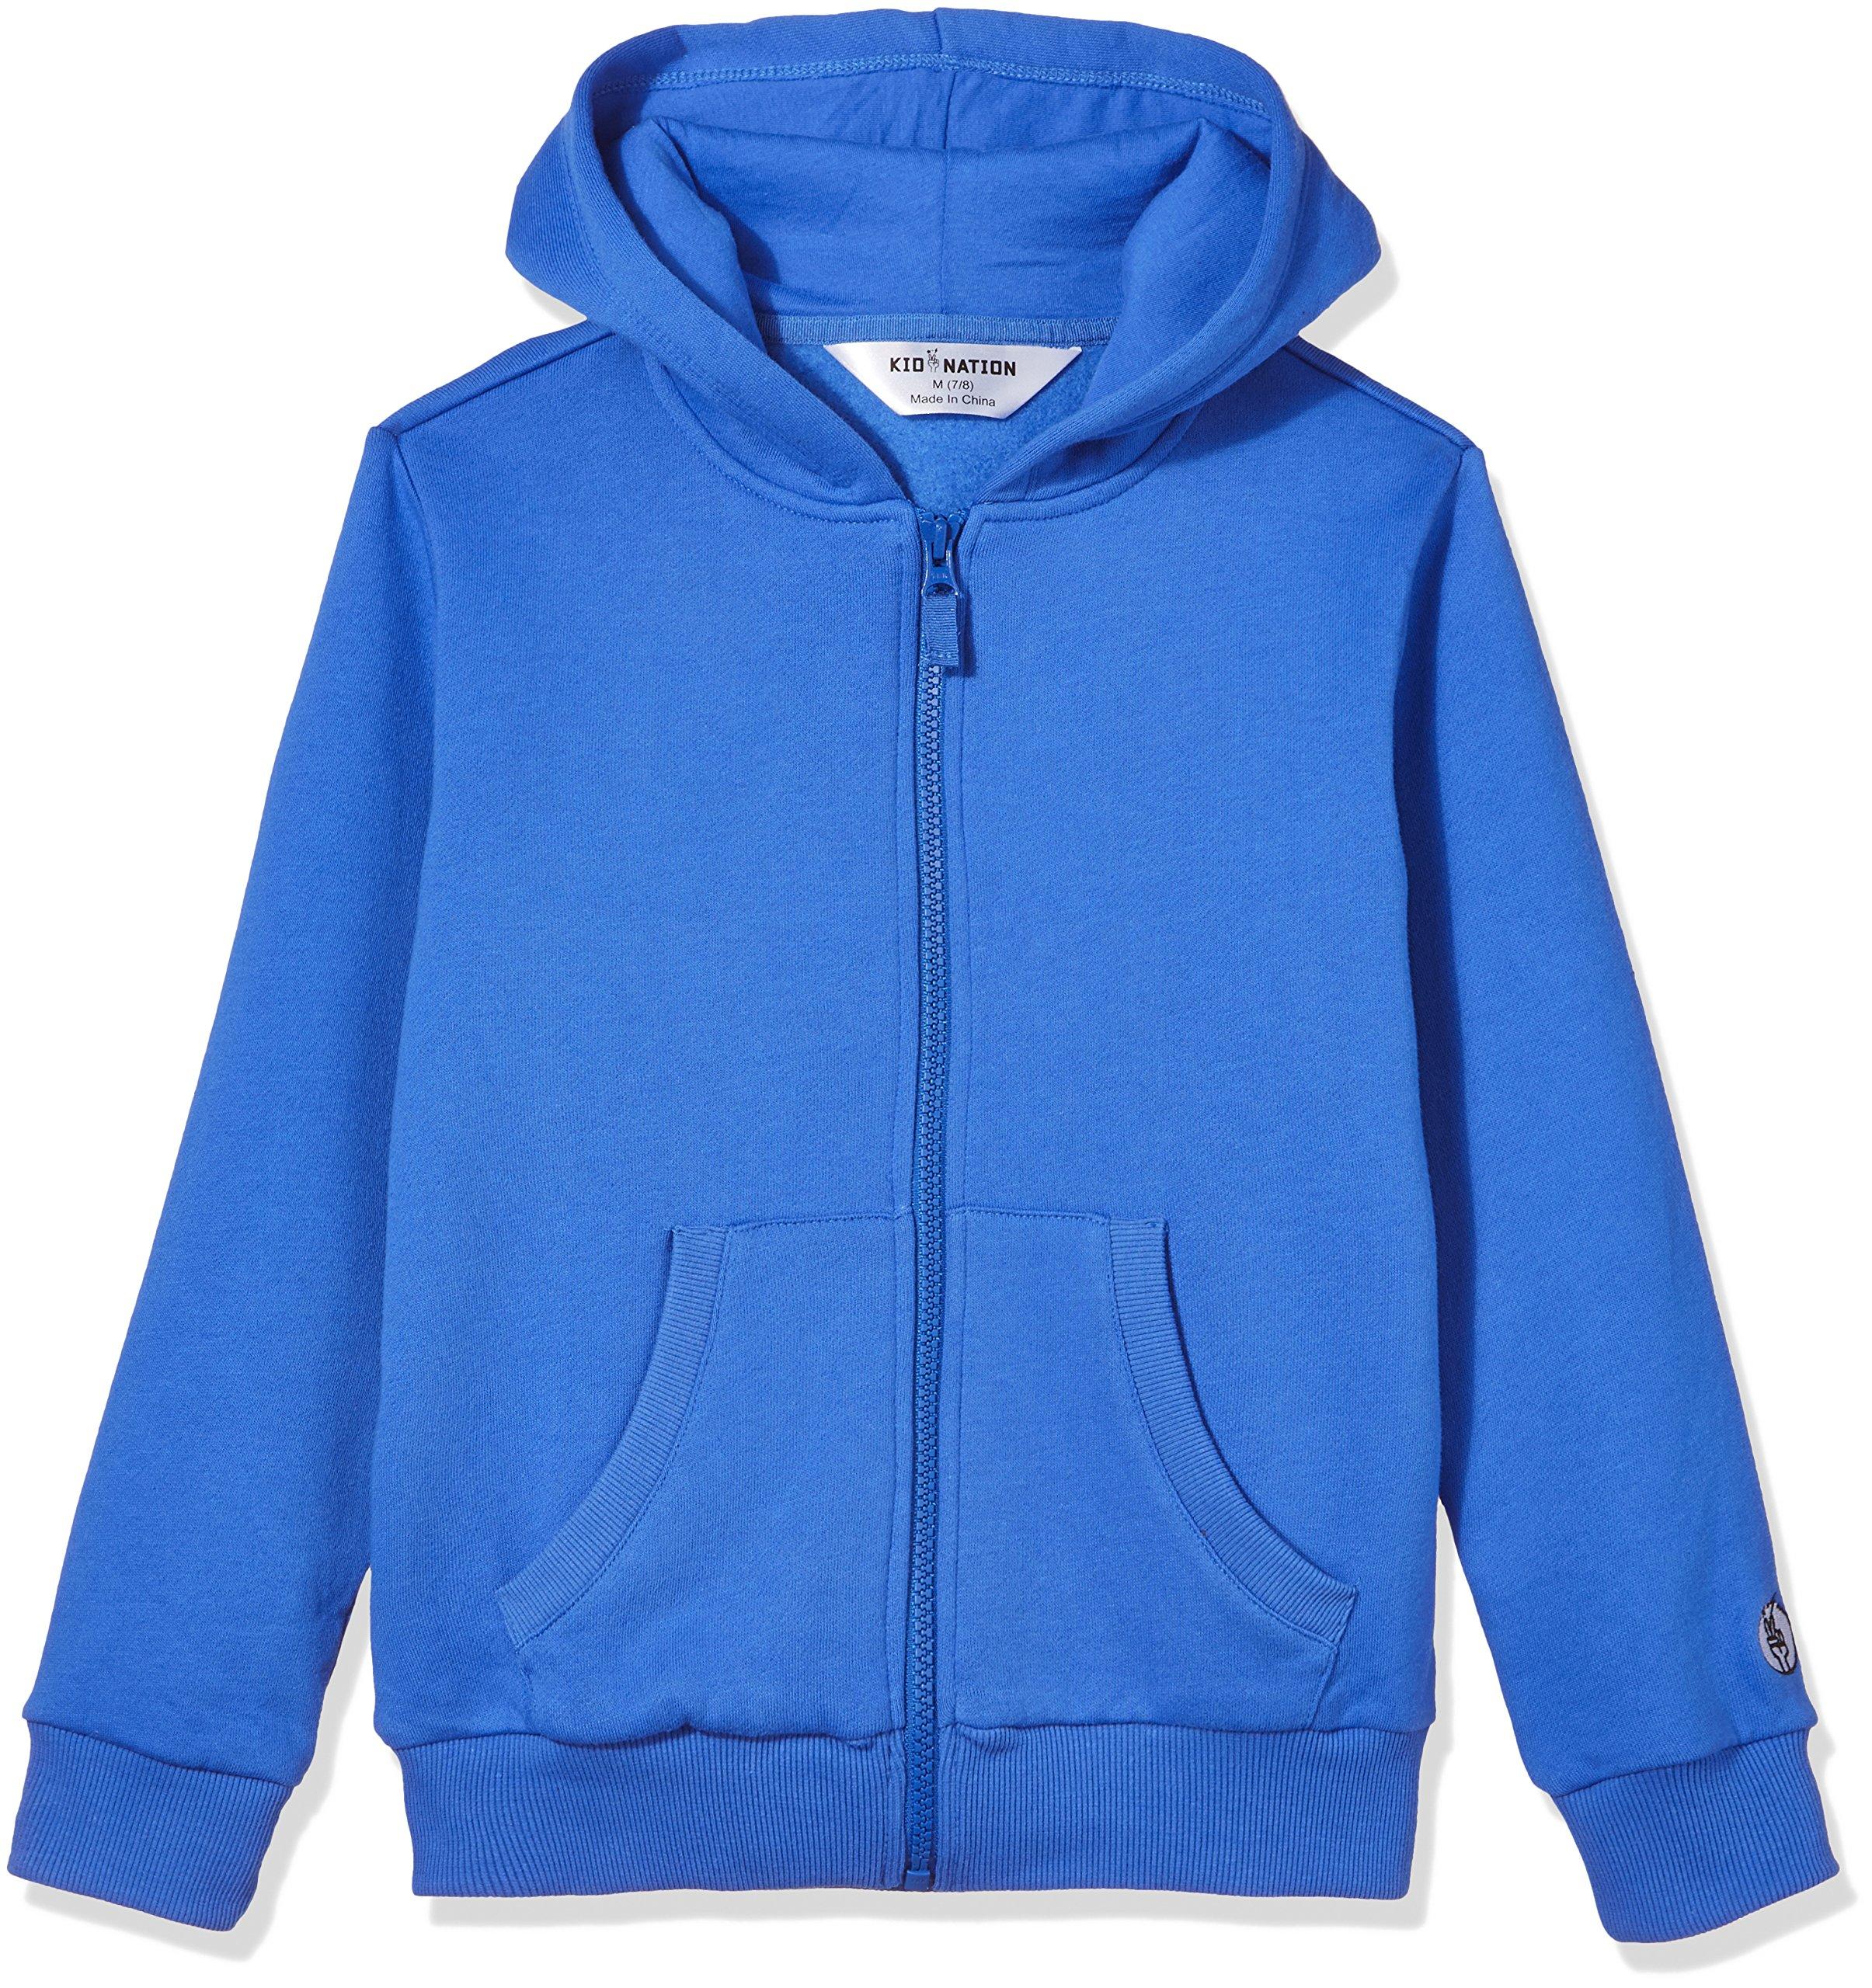 Kid Nation Kids' Brushed Fleece Zip-up Hooded Sweatshirt for Boys Girls M Gray Blue